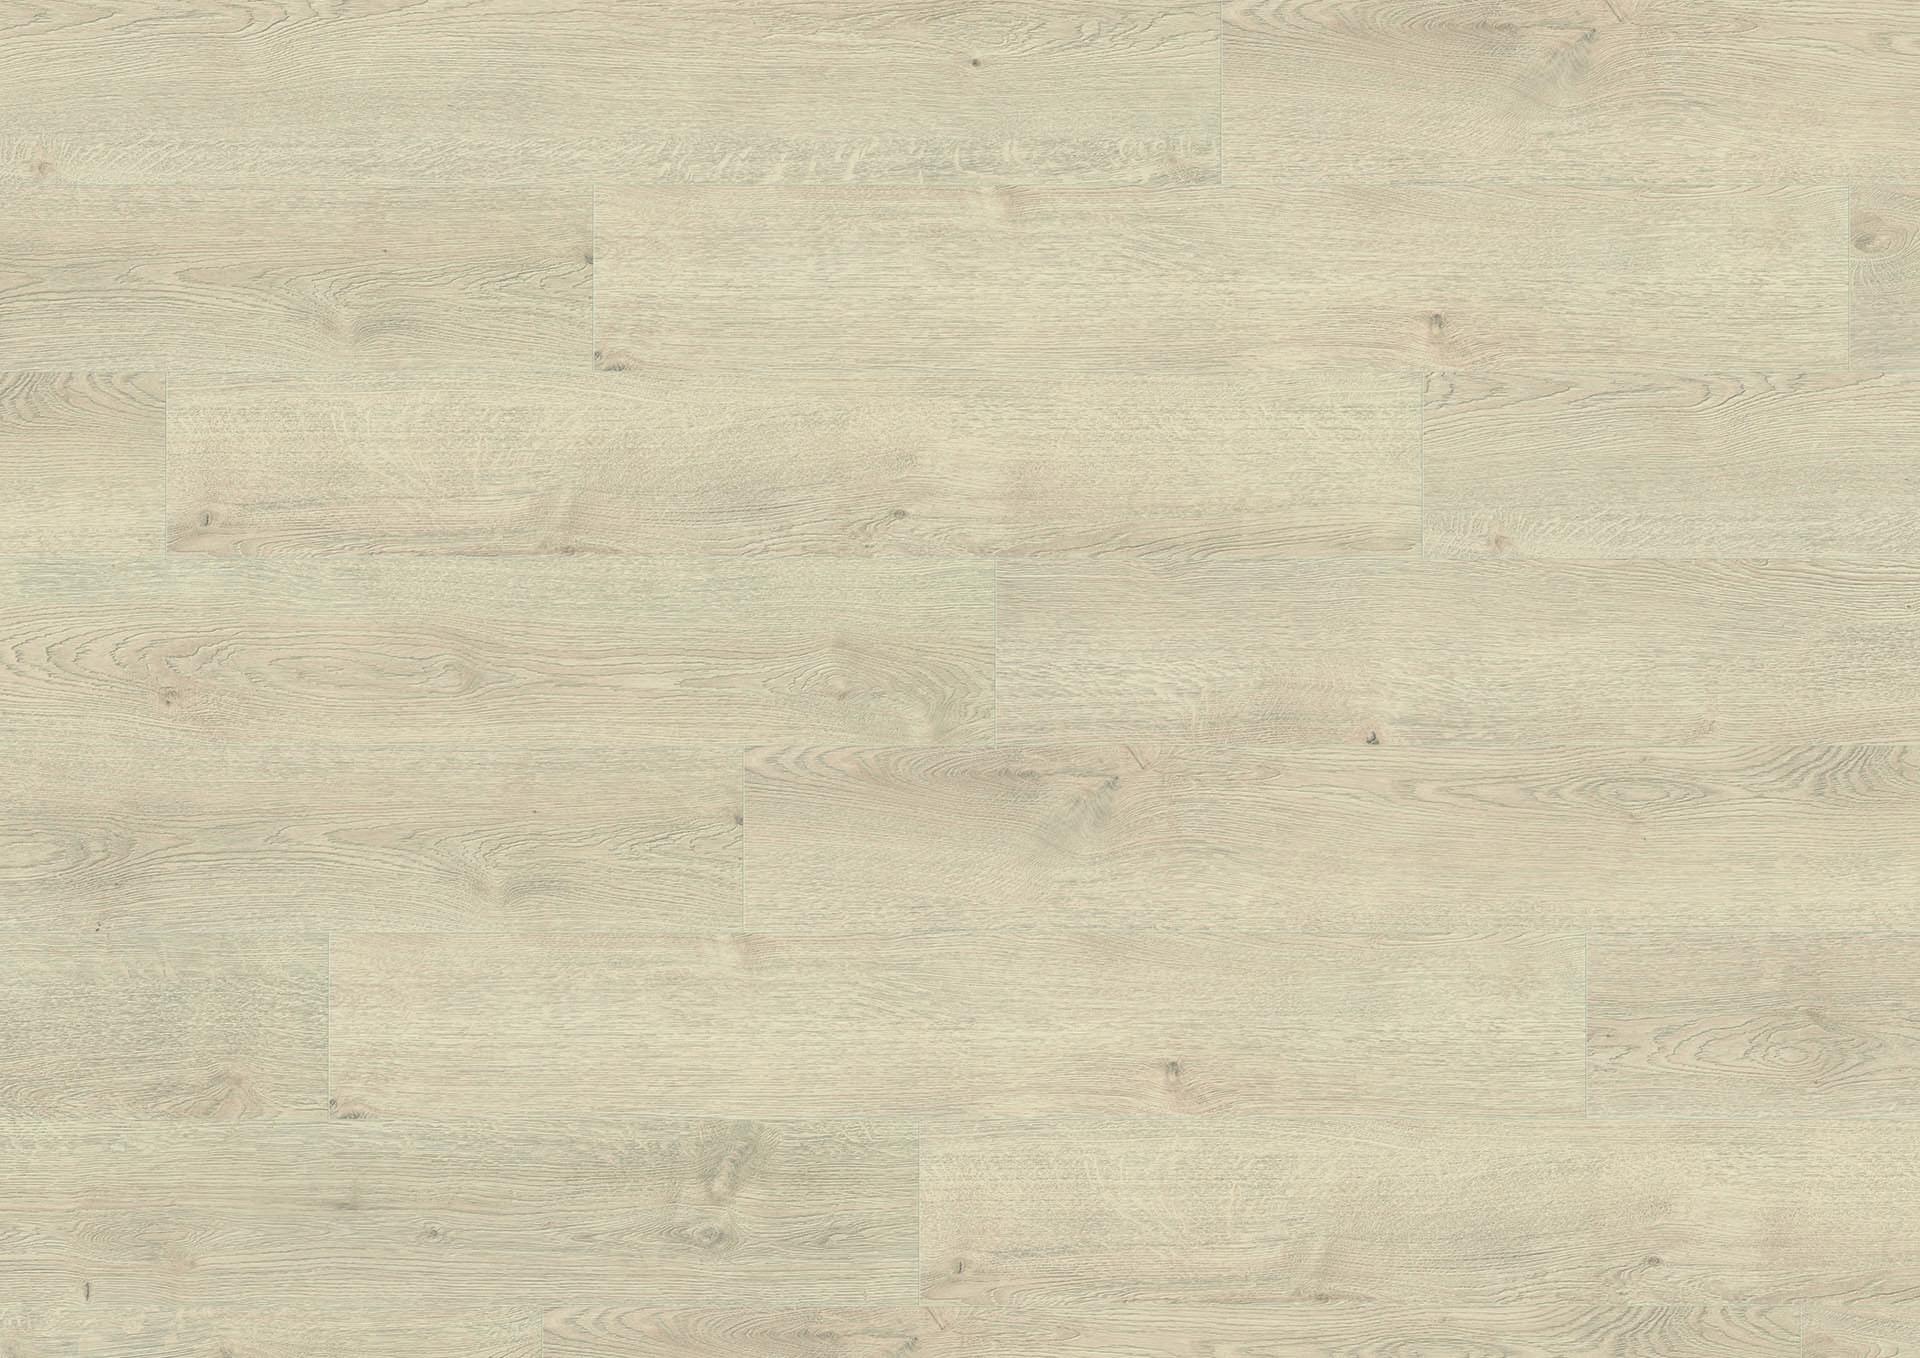 Egger Ламинат Pro Classic 8-32 Aqua Plus EPL045 Дуб Ньюбери белый